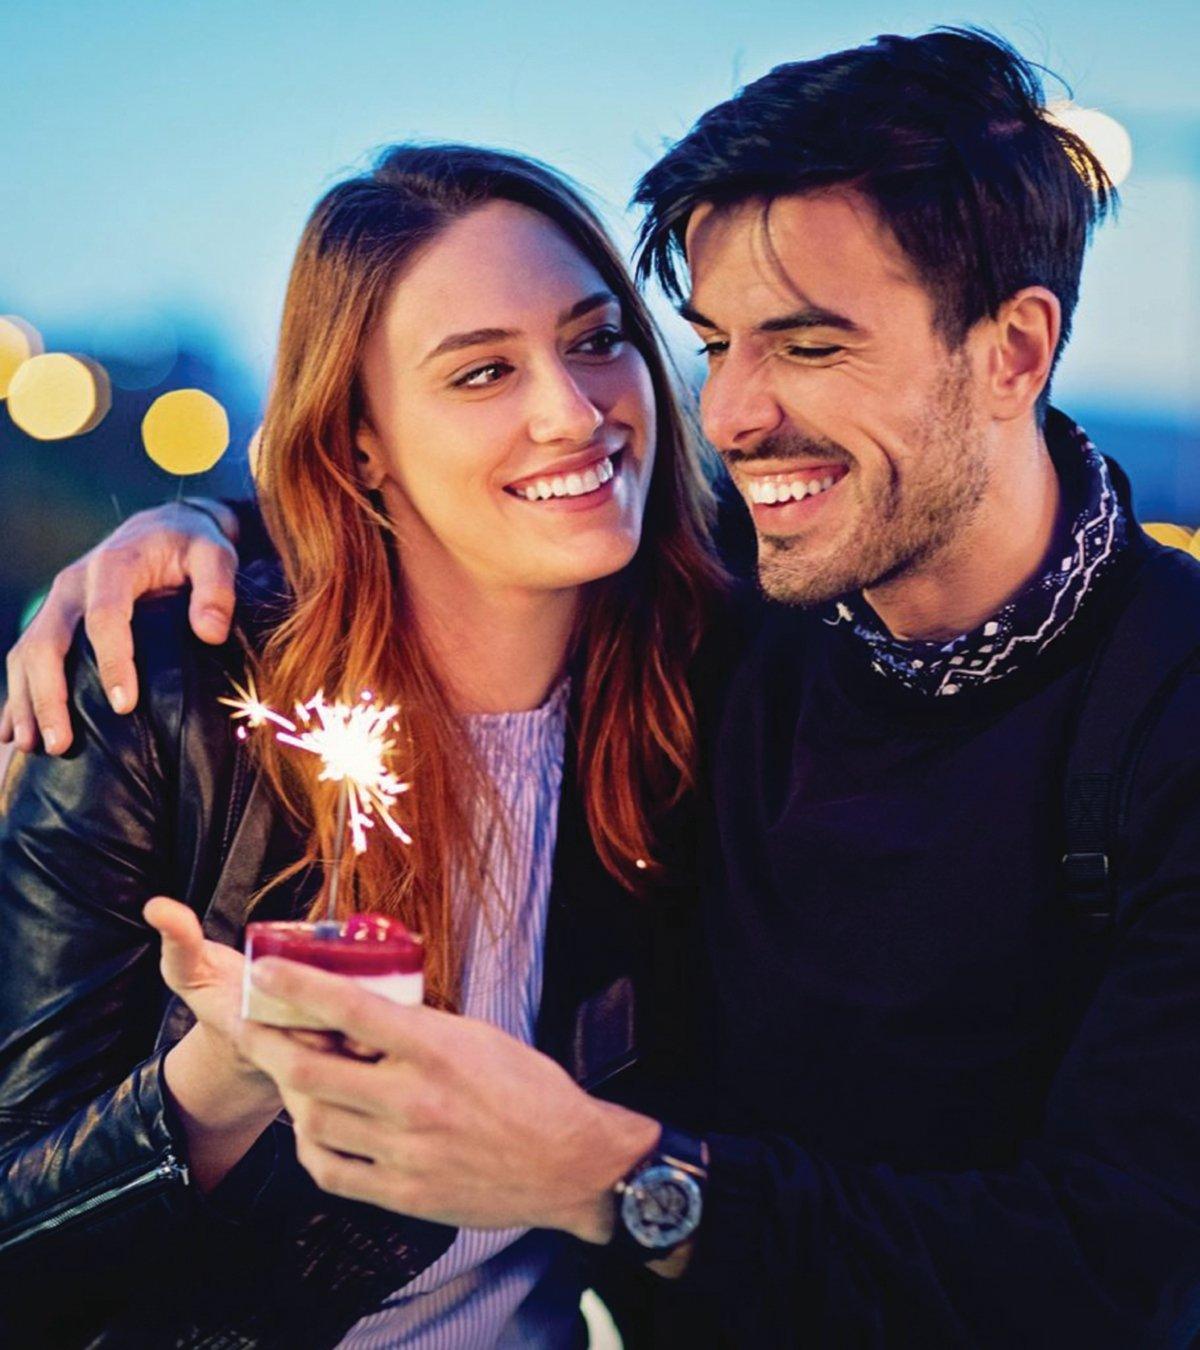 KOMUNIKASI skil sangat penting apabila dengan pasangan. - FOTO Google